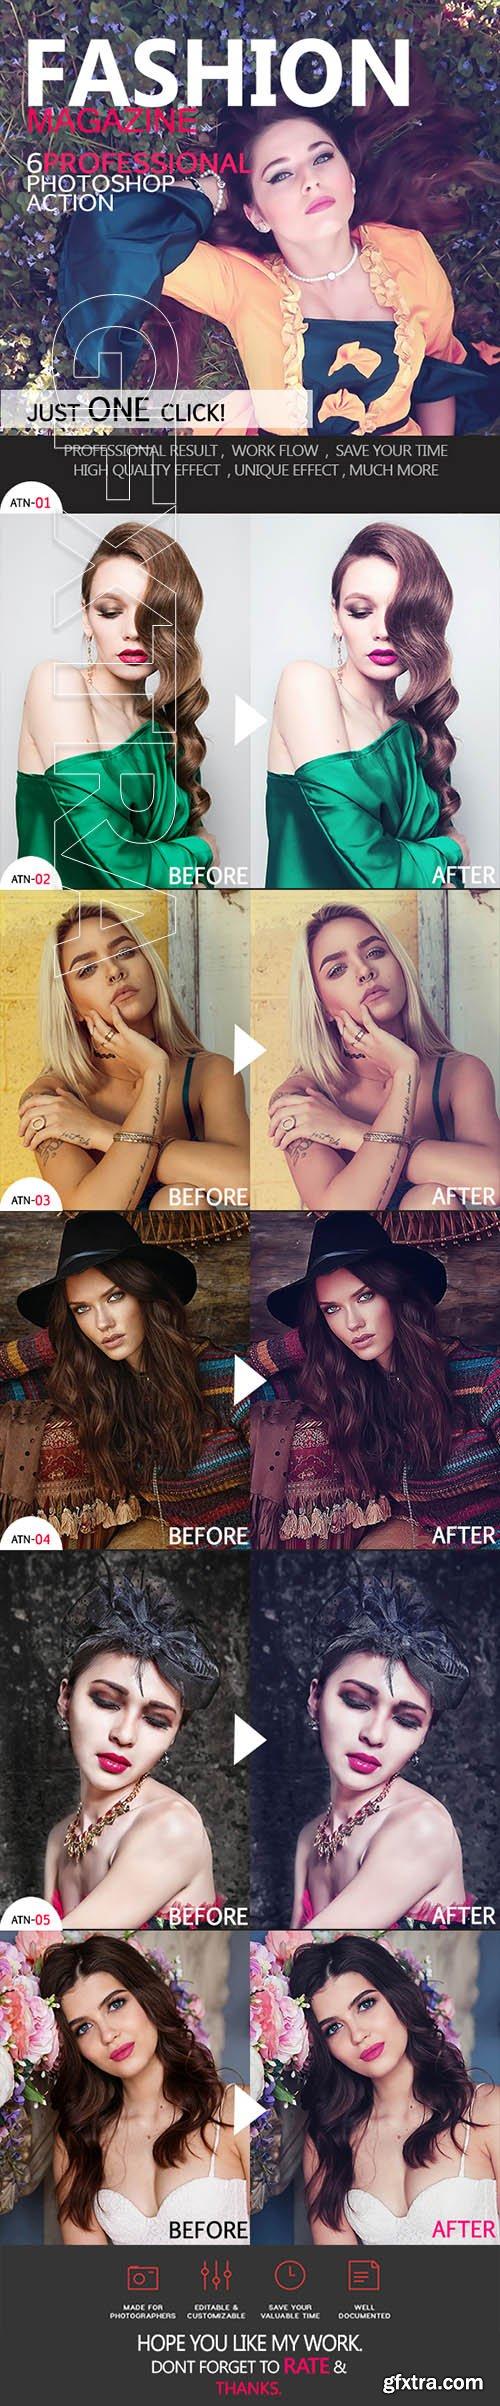 GraphicRiver - Fashion Magazine Photoshop Action 22330766